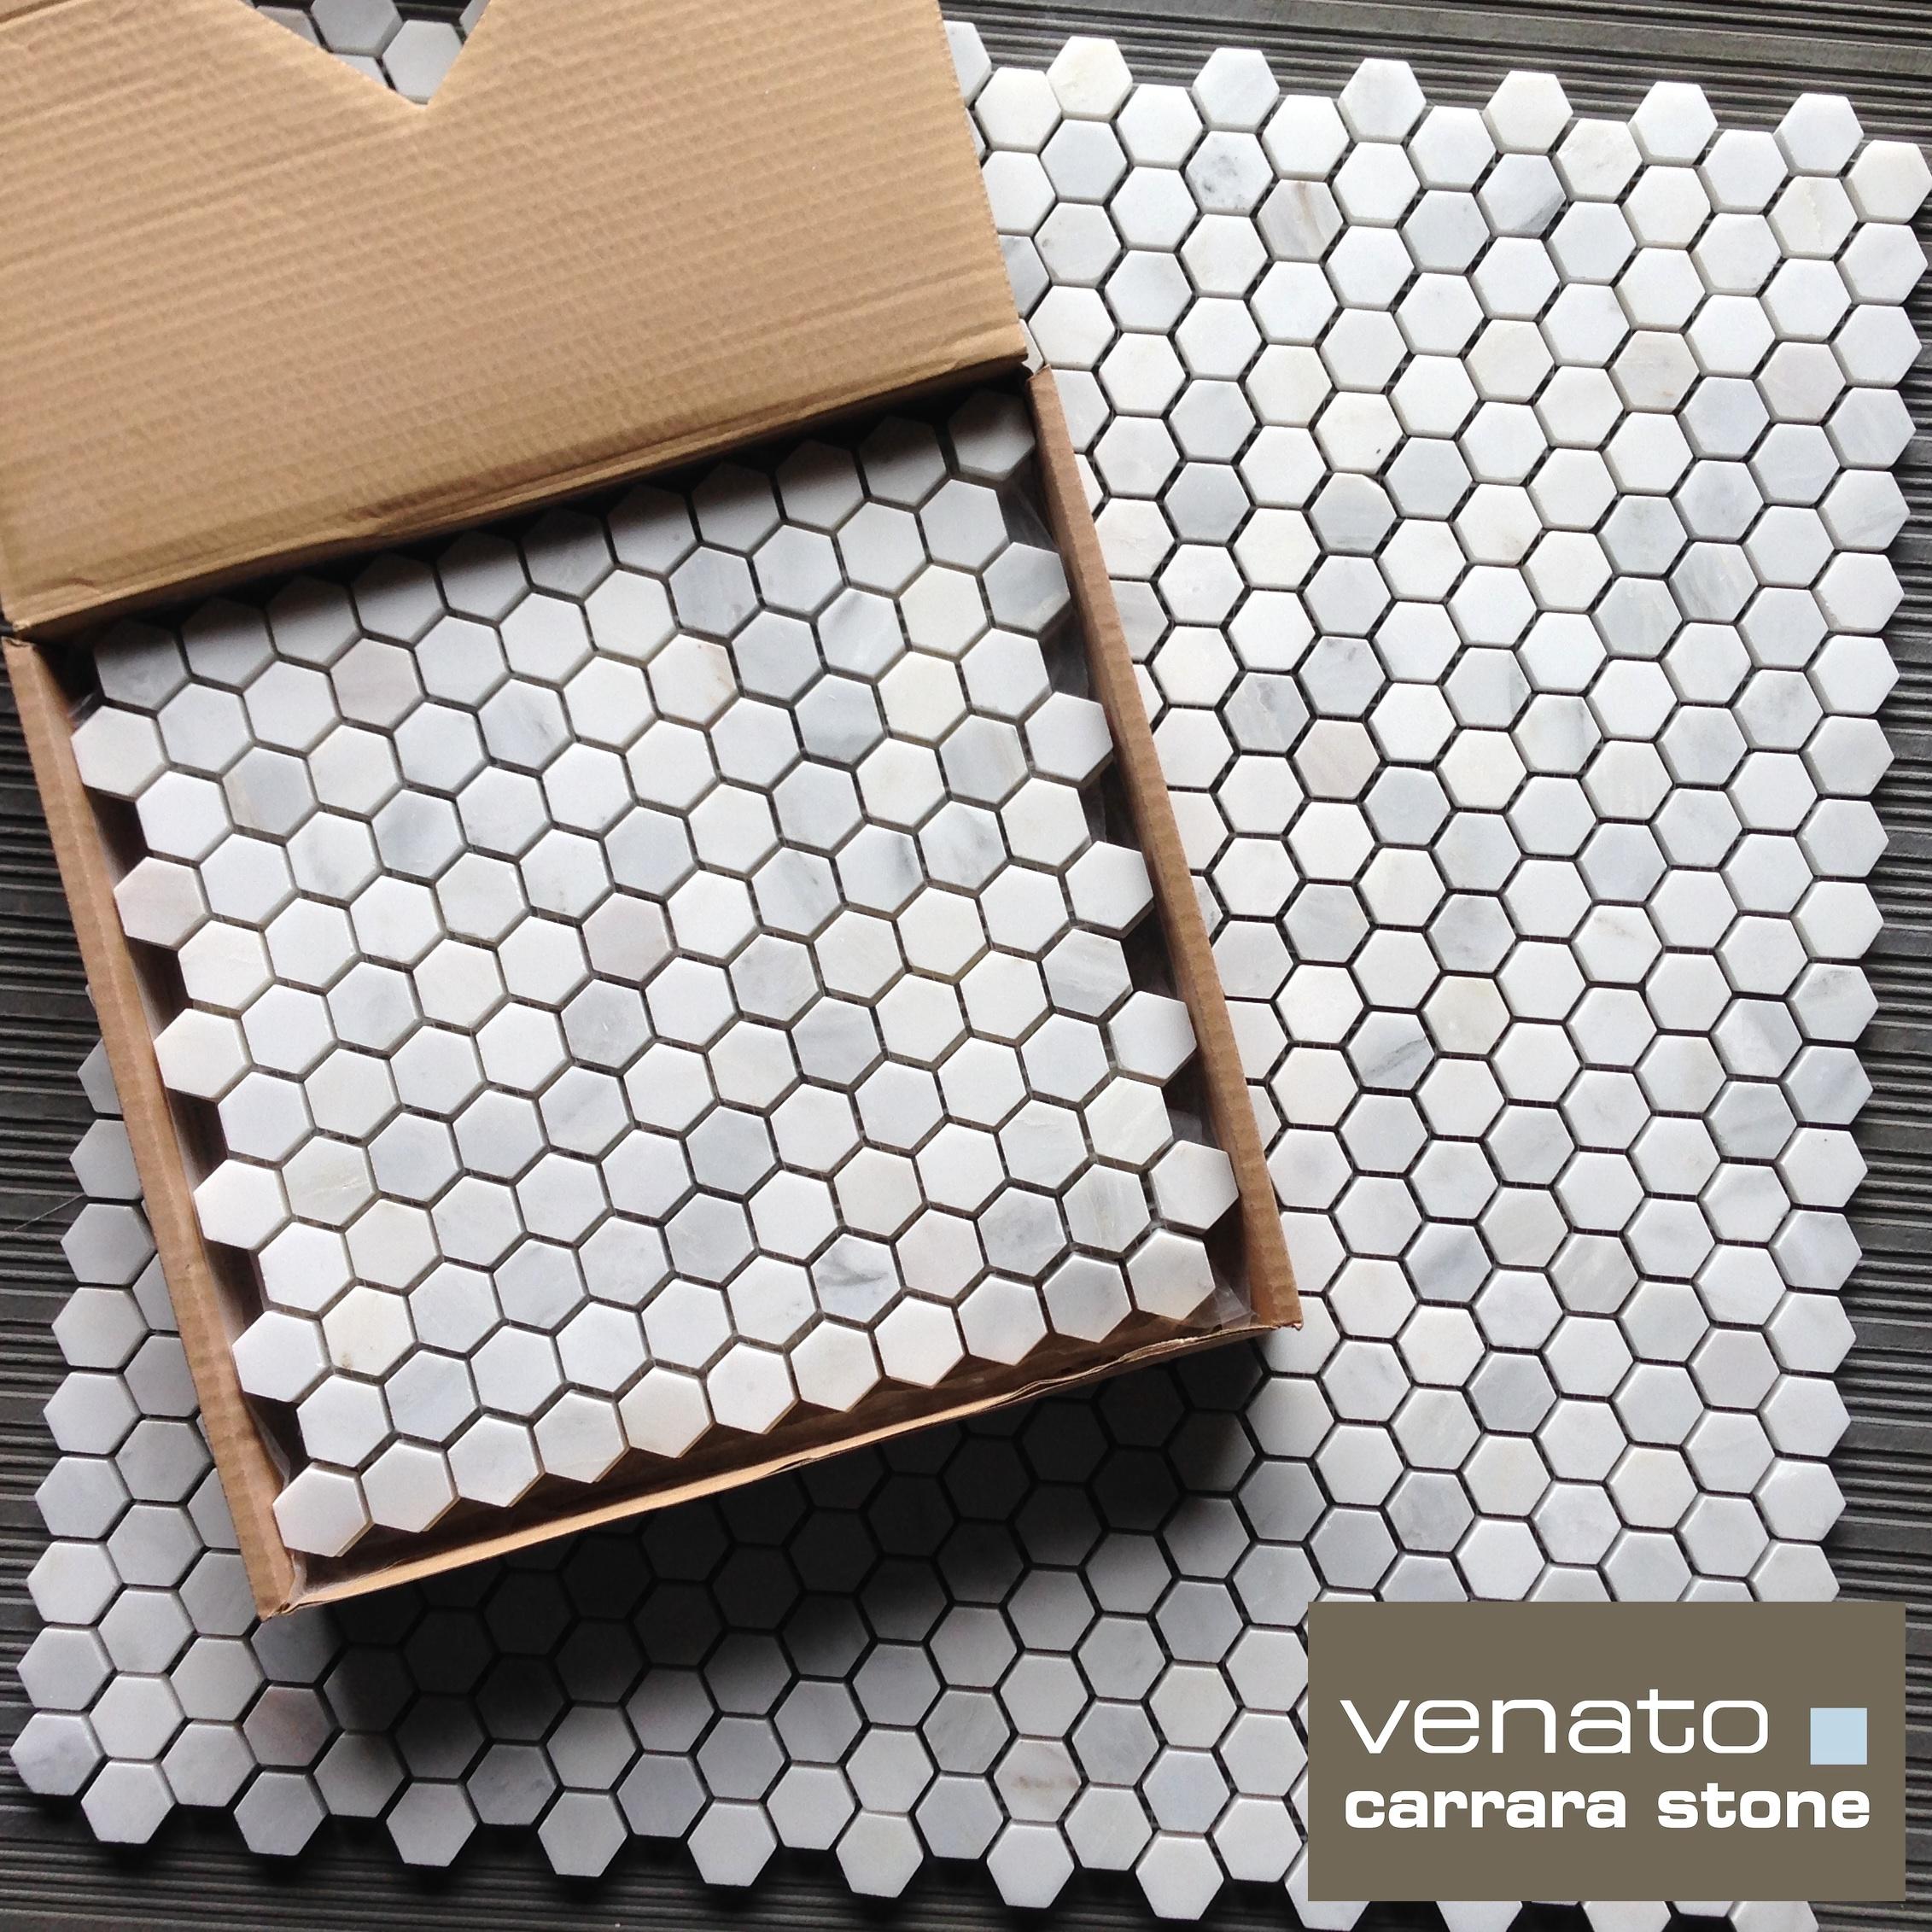 Carrera Marble Tile : Carrara venato the builder depot